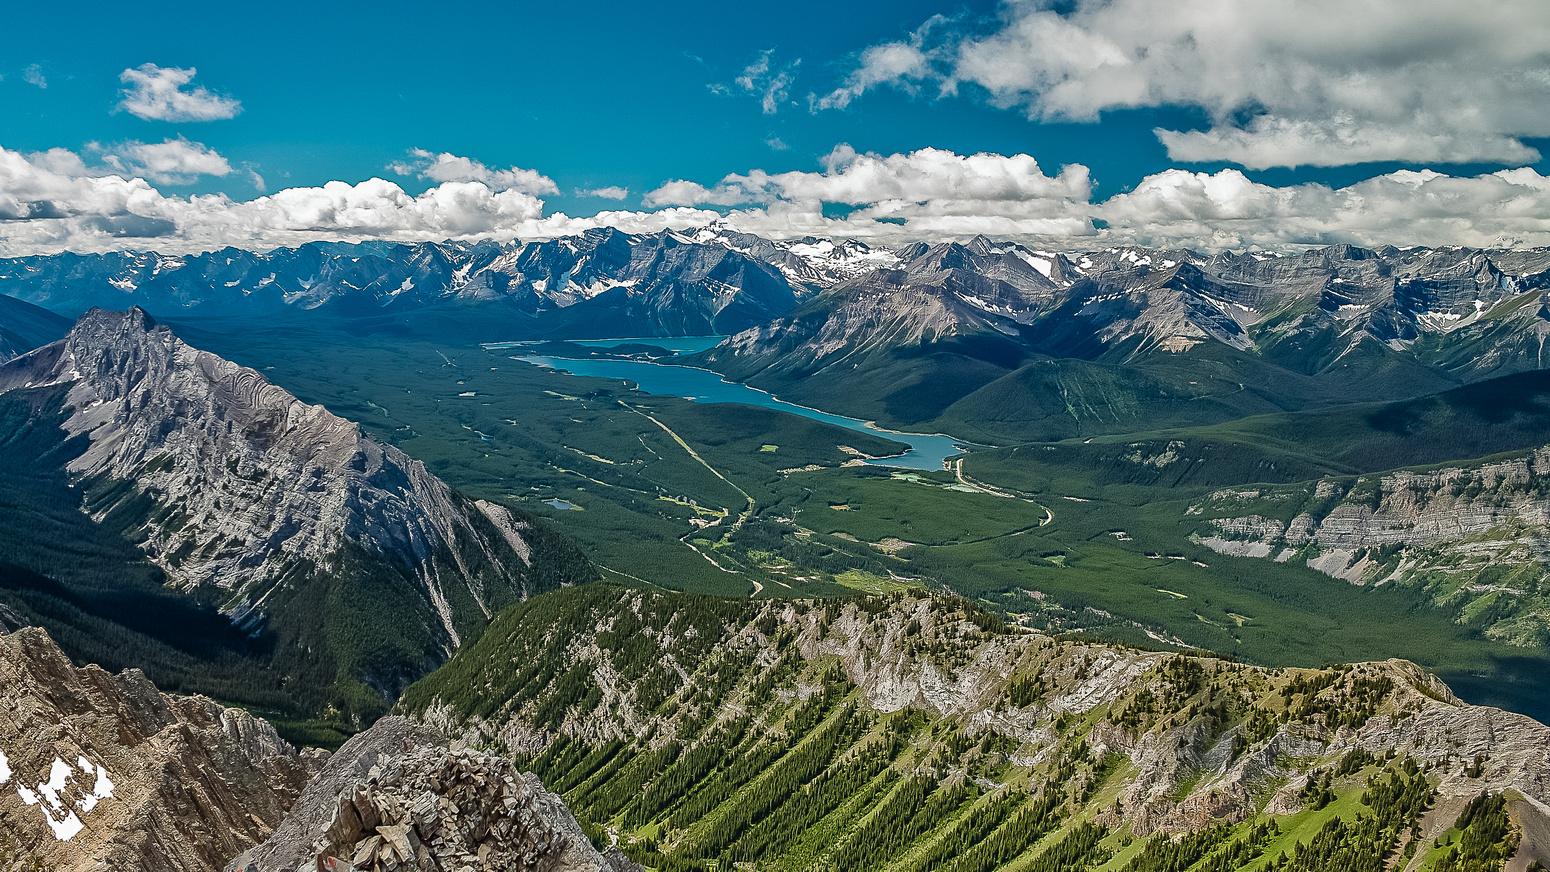 Amazing view looking towards the Kananaskis Lakes over King Creek Ridge and Mount Wintour.